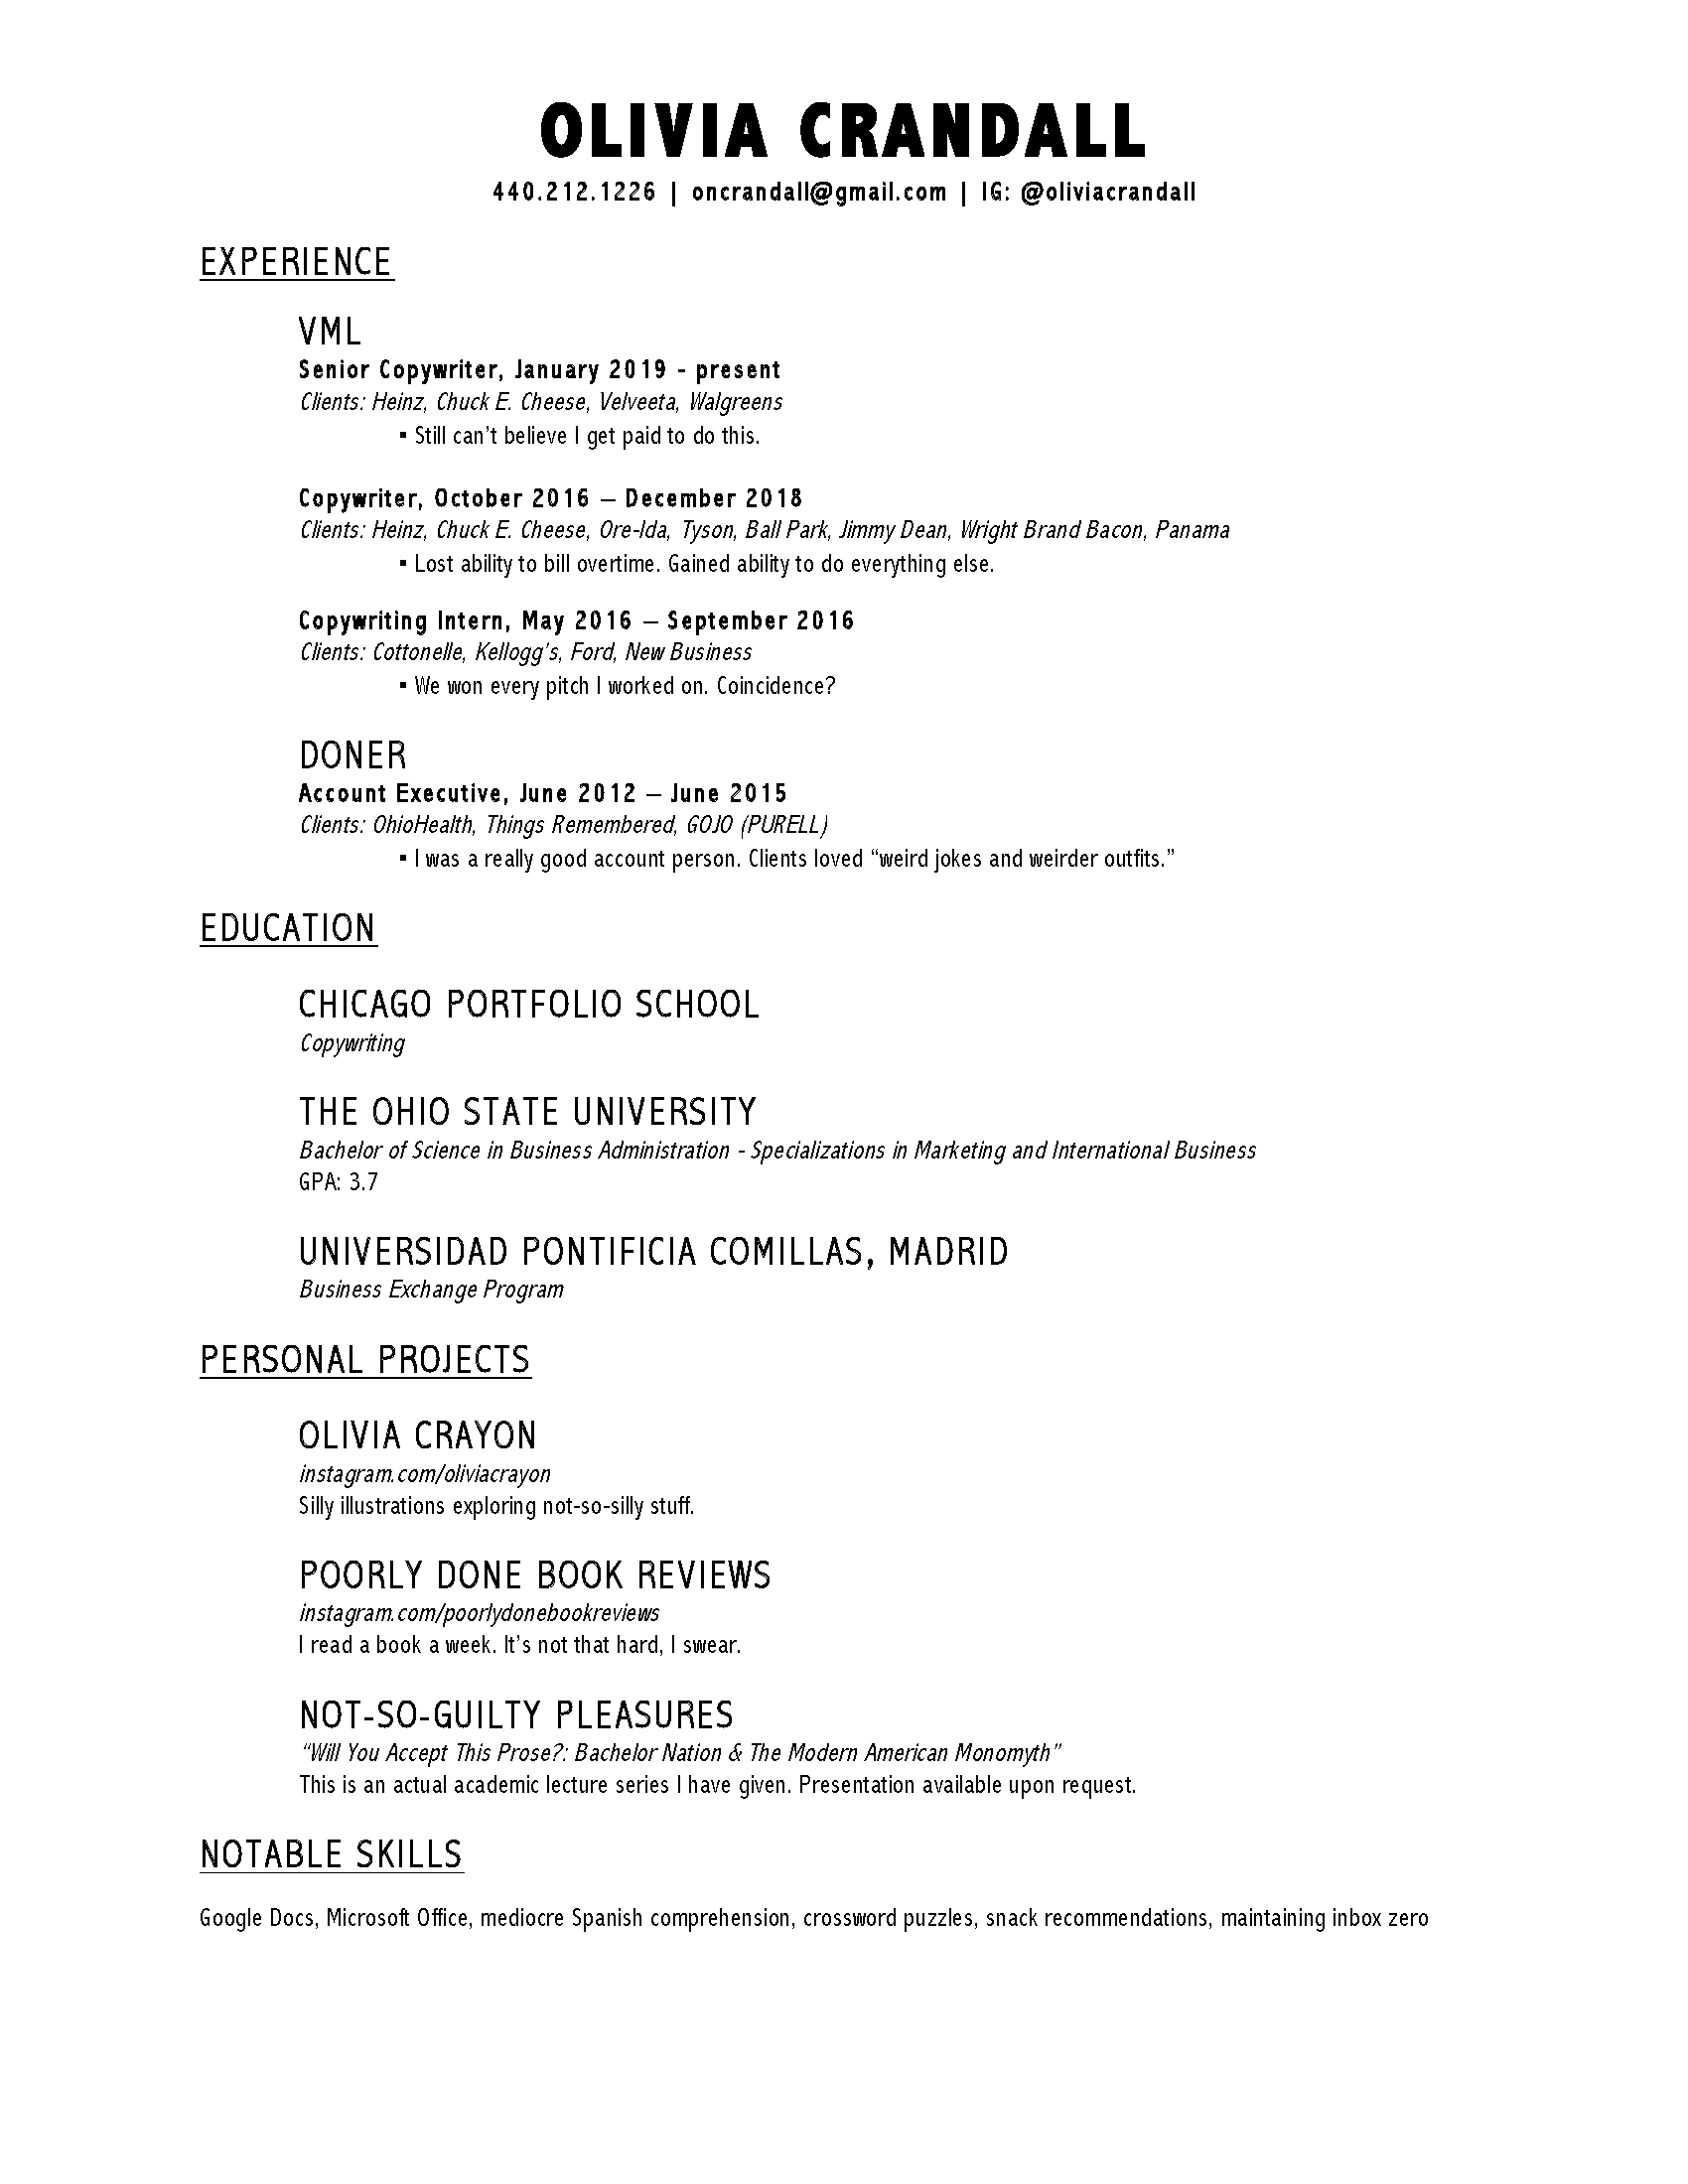 Crandall_Resume.png